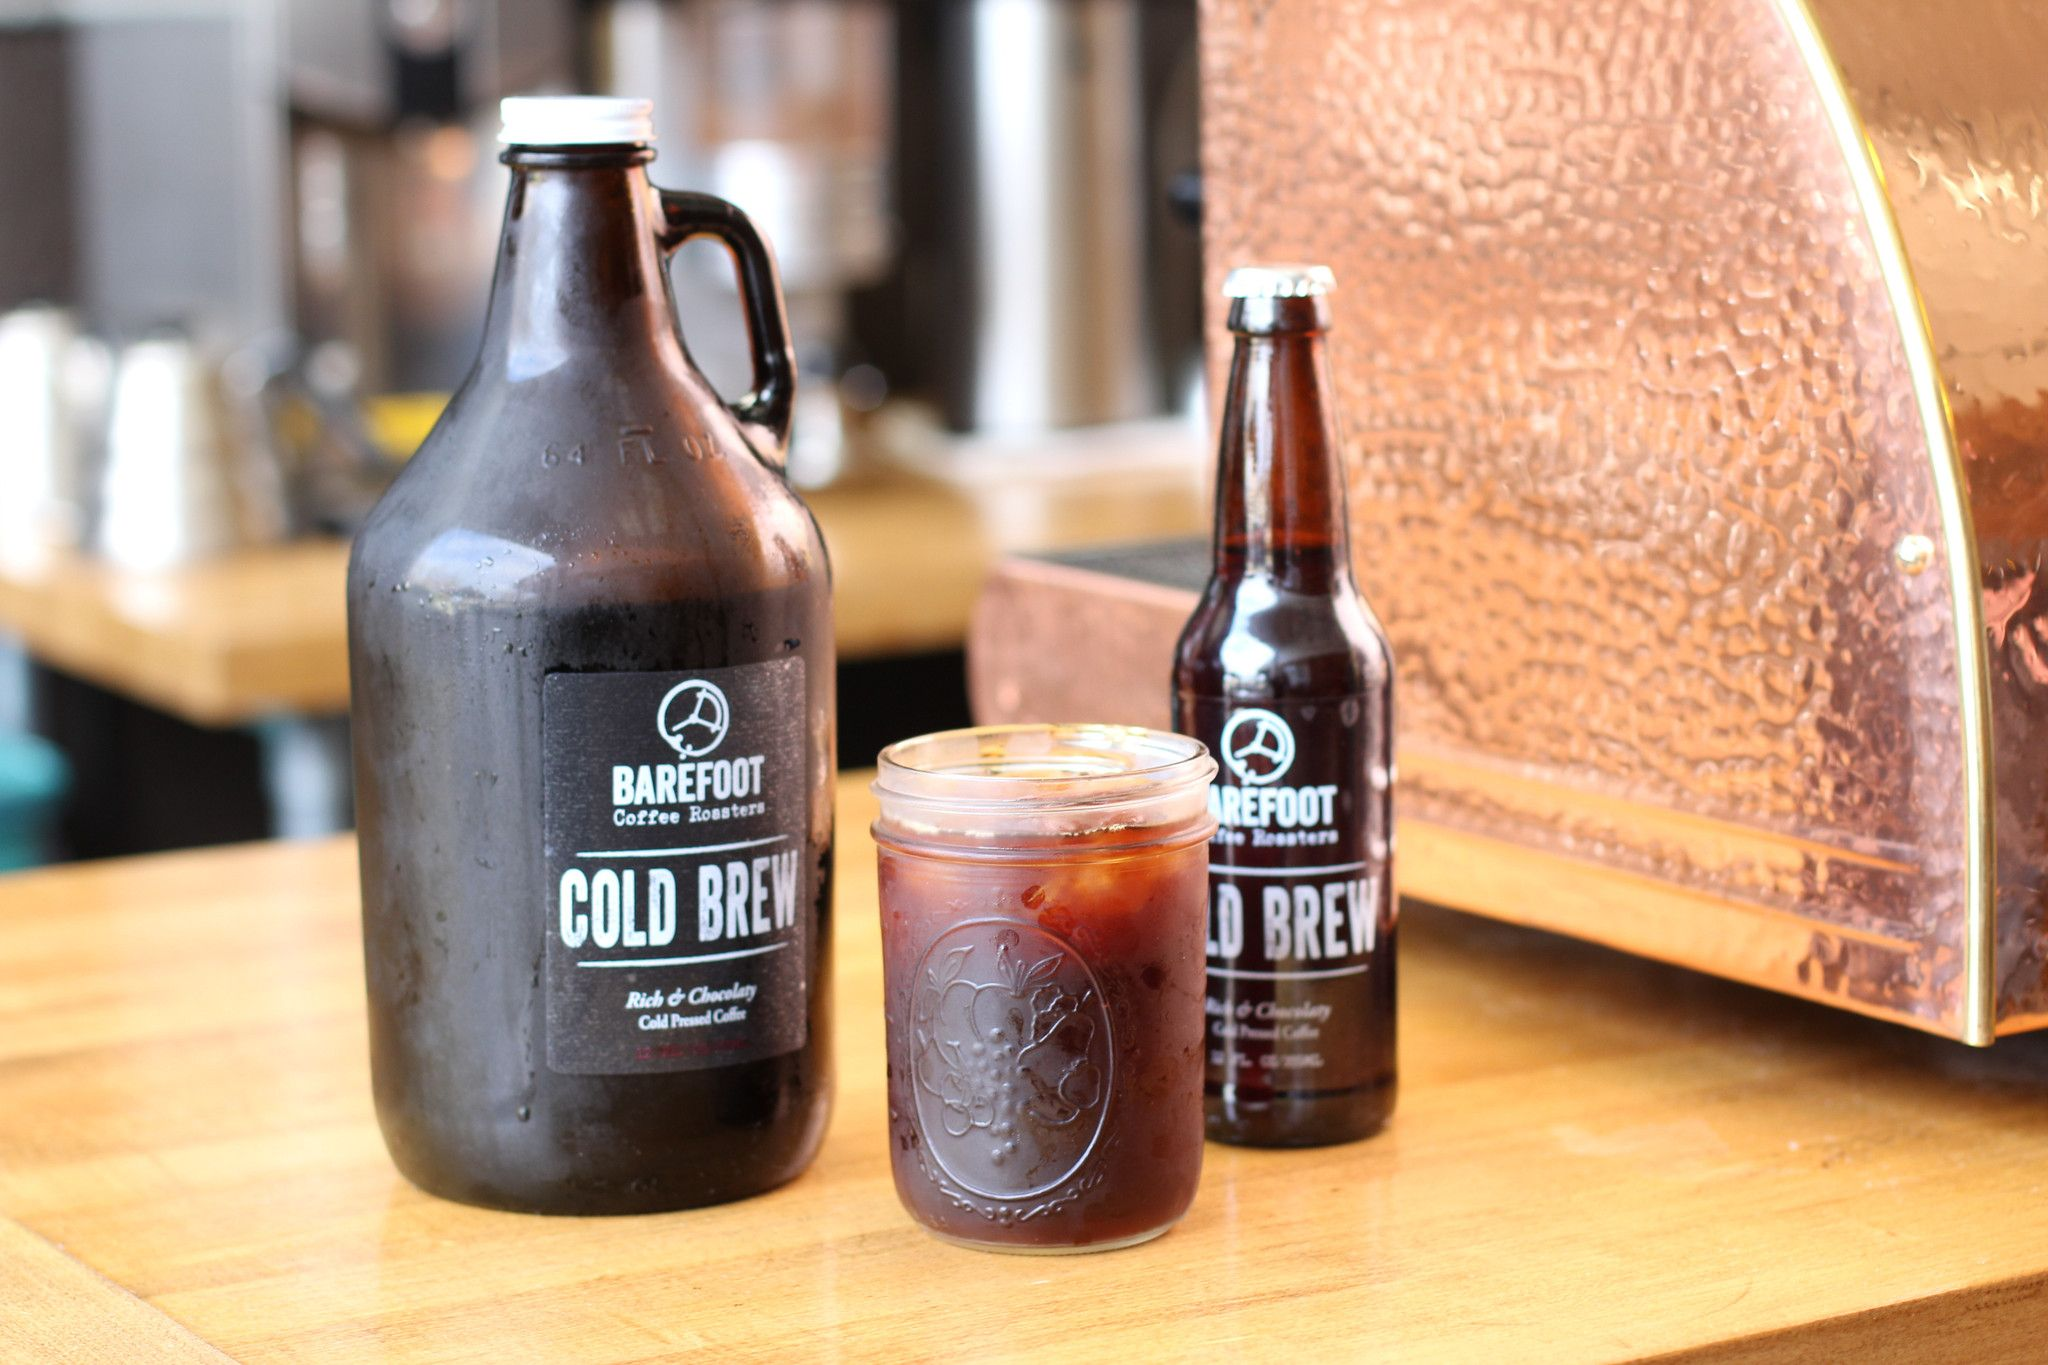 Cold brew Cold brew packaging, Cold brew, Brewing